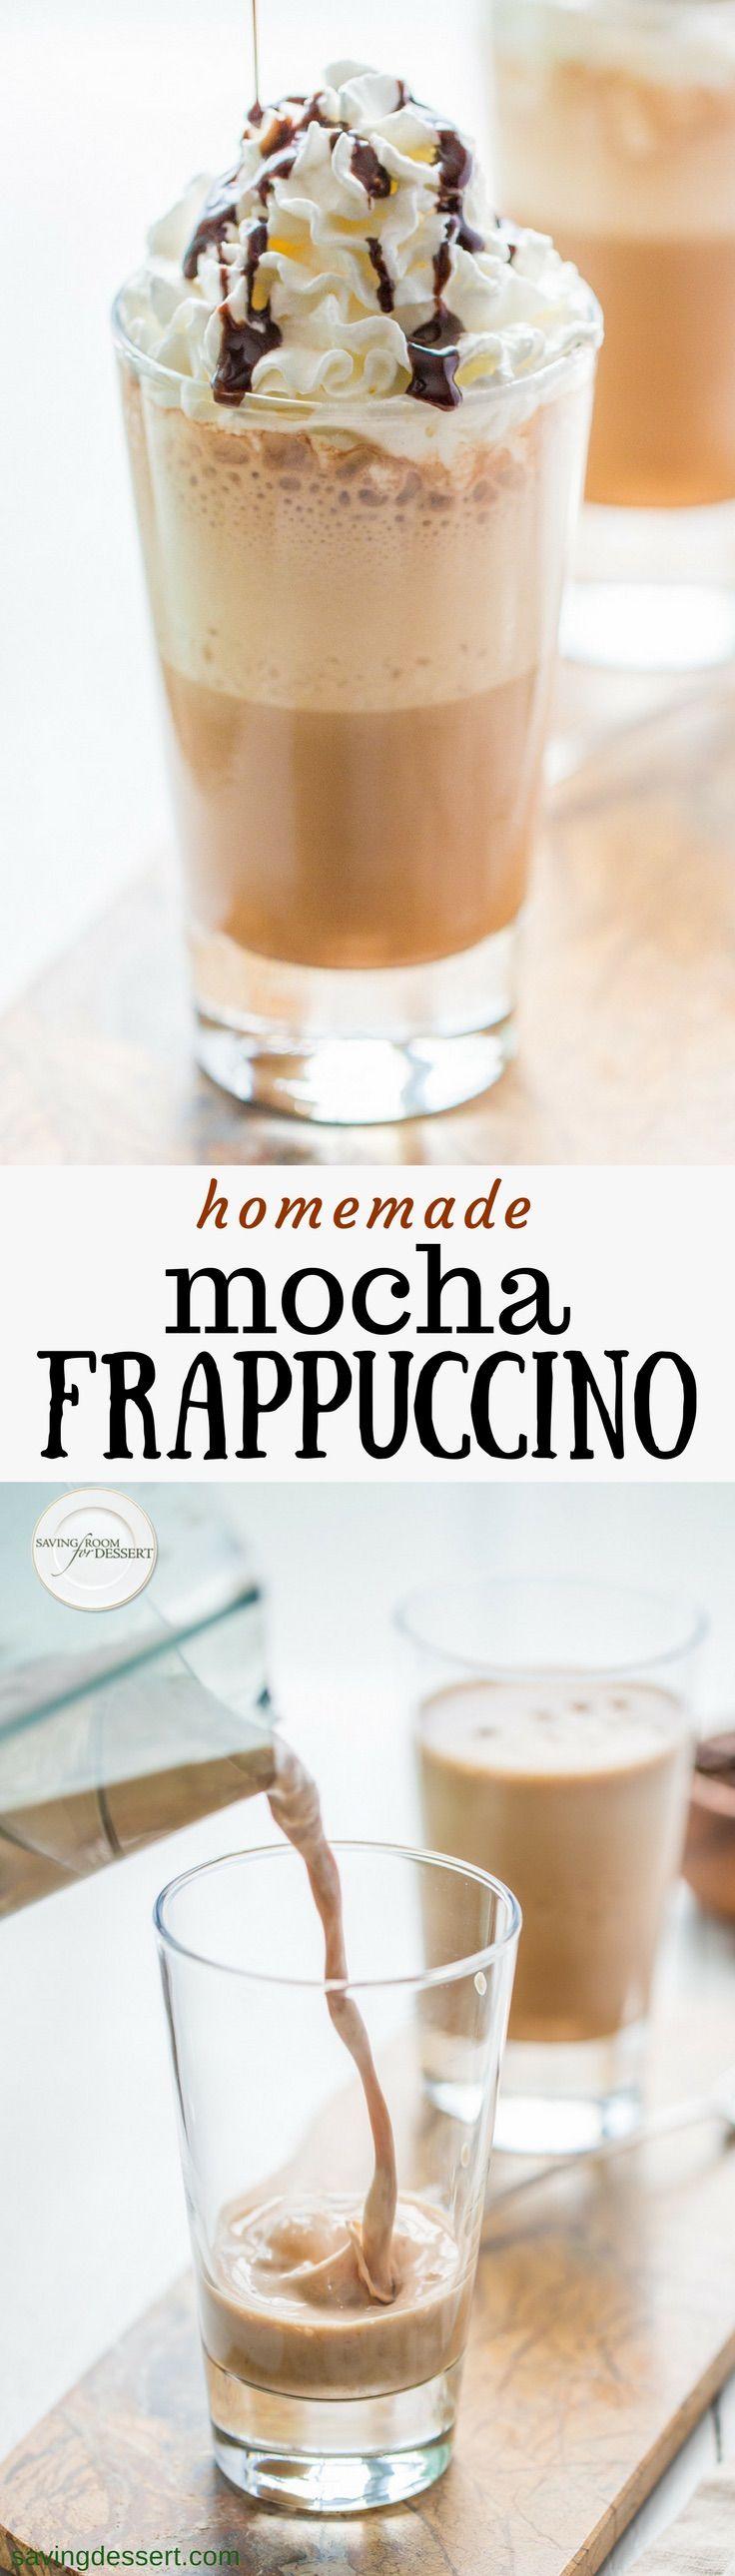 Homemade Mocha Frappuccino Recipe Homemade mocha